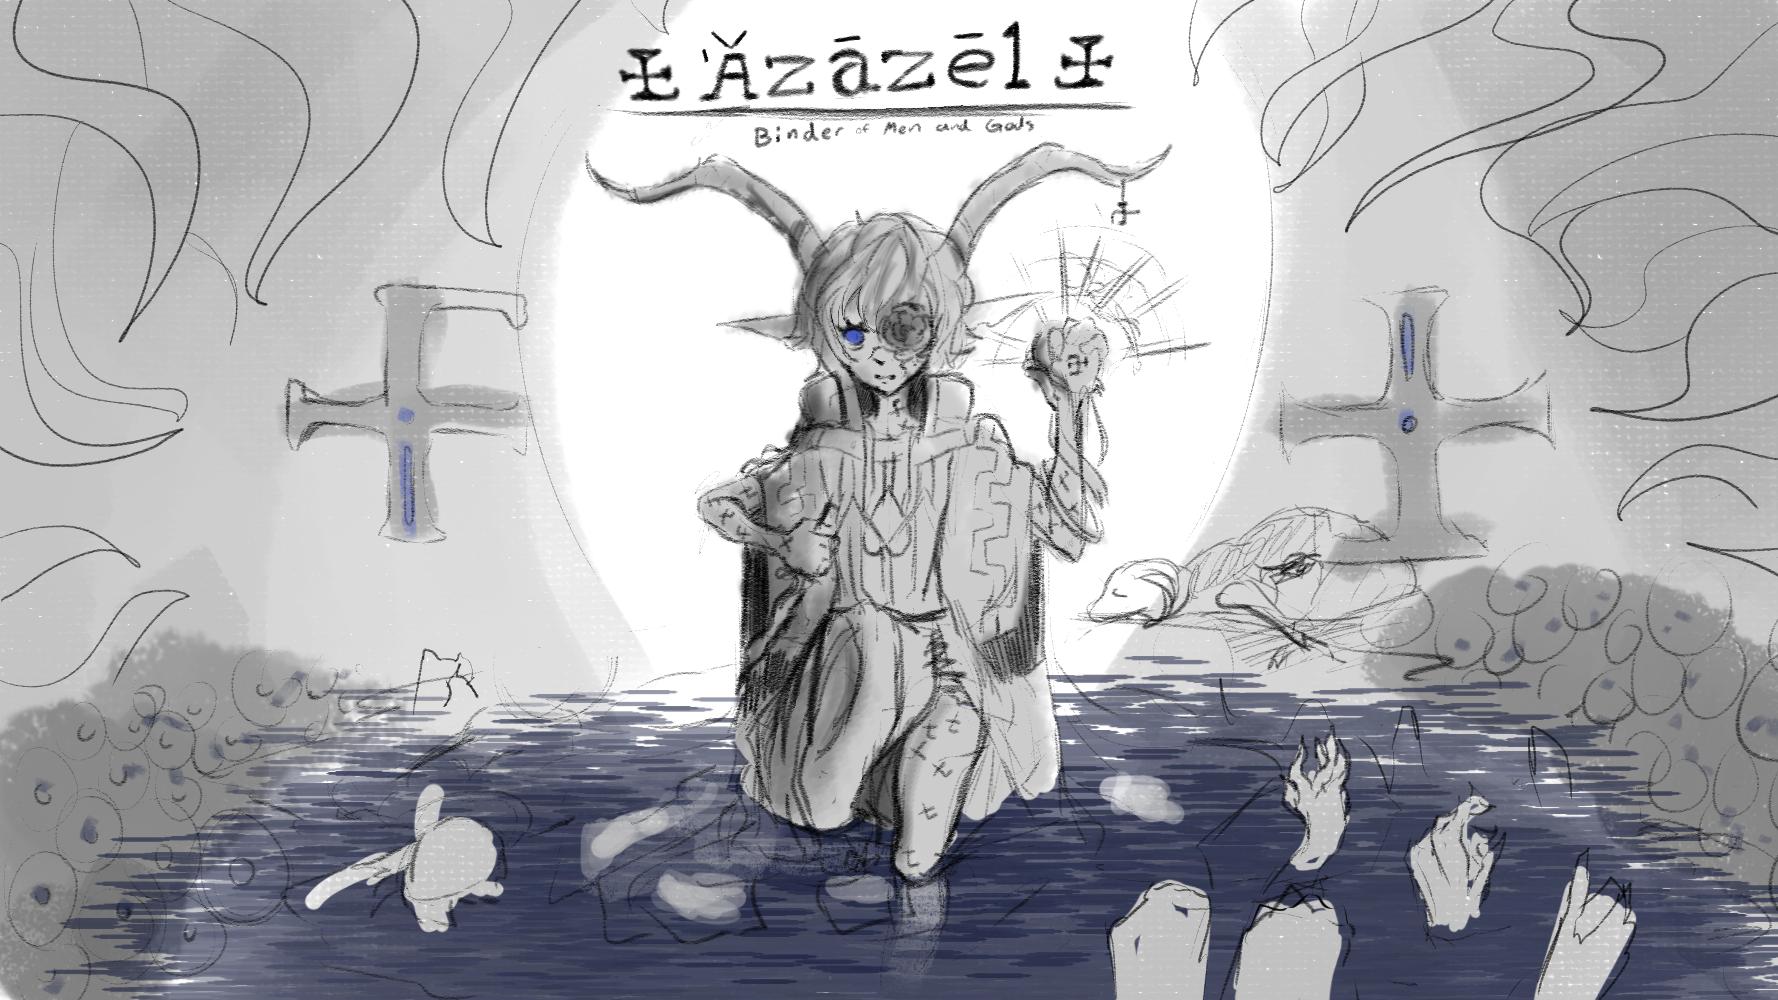 Azazel Sketch